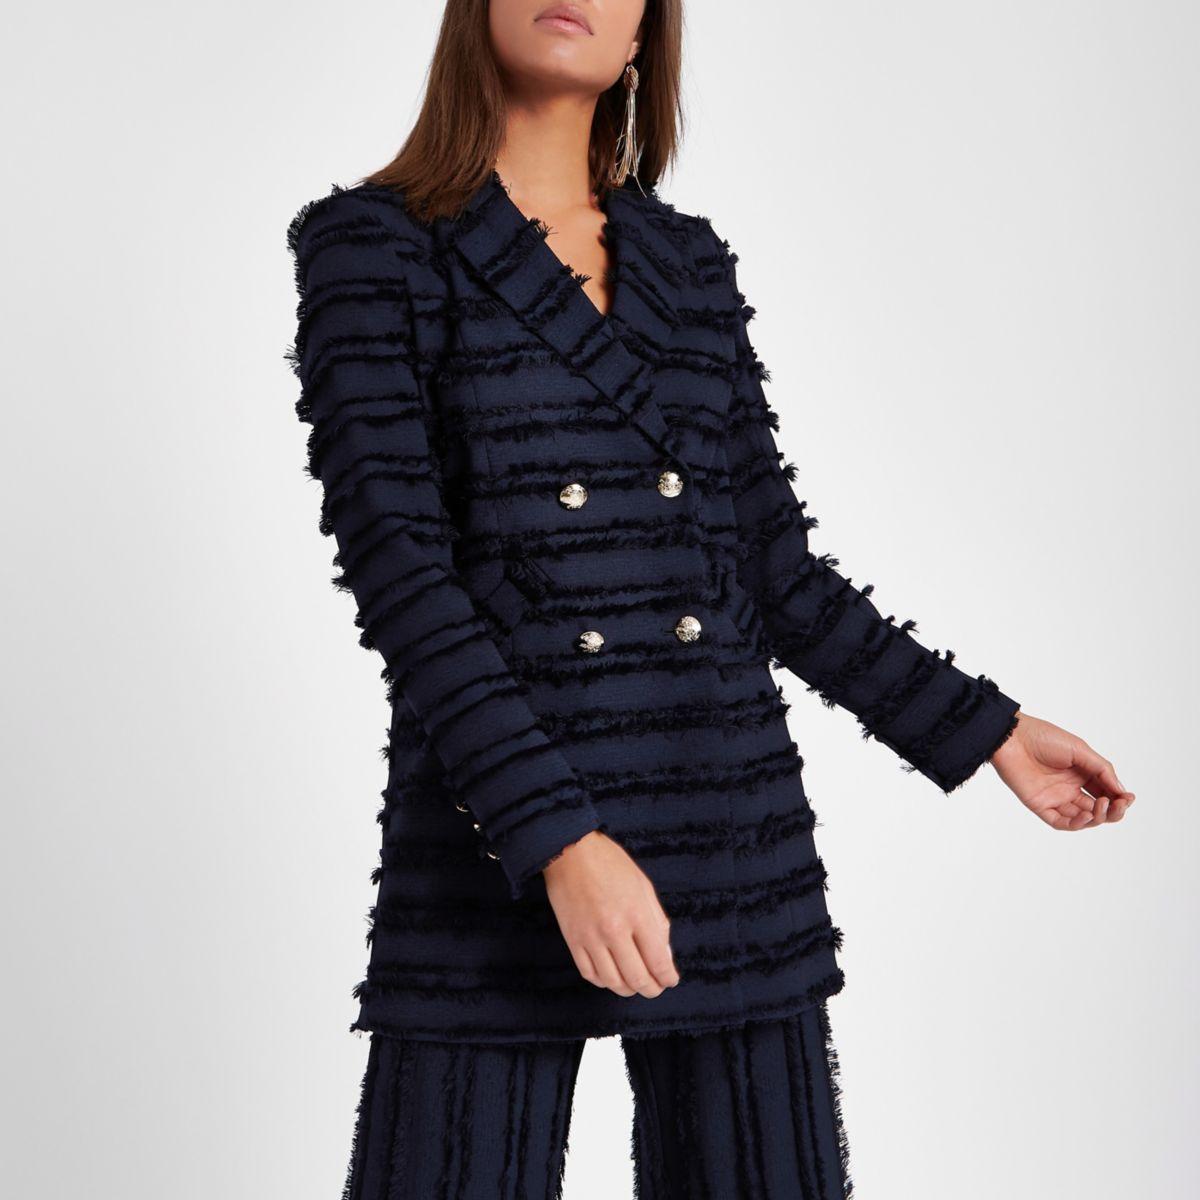 veste crois e bleu marine franges manteaux vestes promo femme. Black Bedroom Furniture Sets. Home Design Ideas